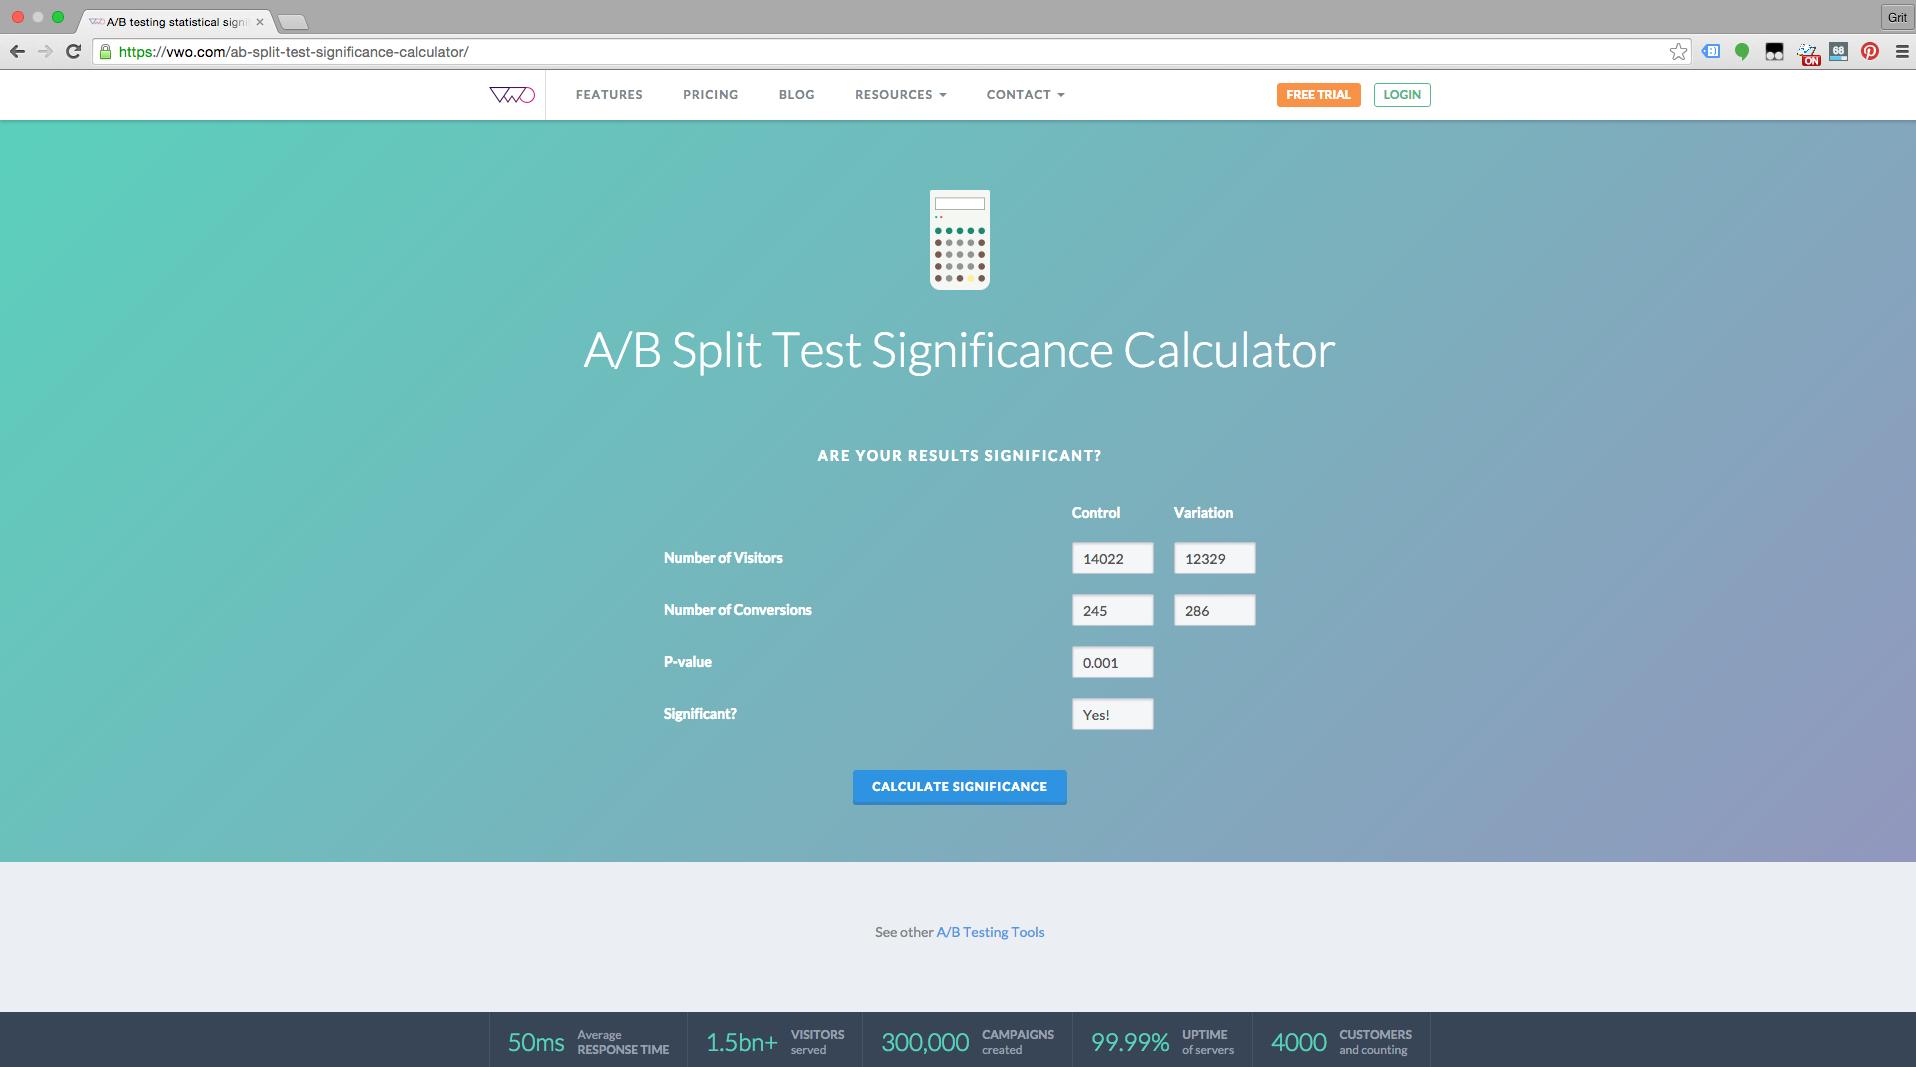 Split-Test Significance Calculator